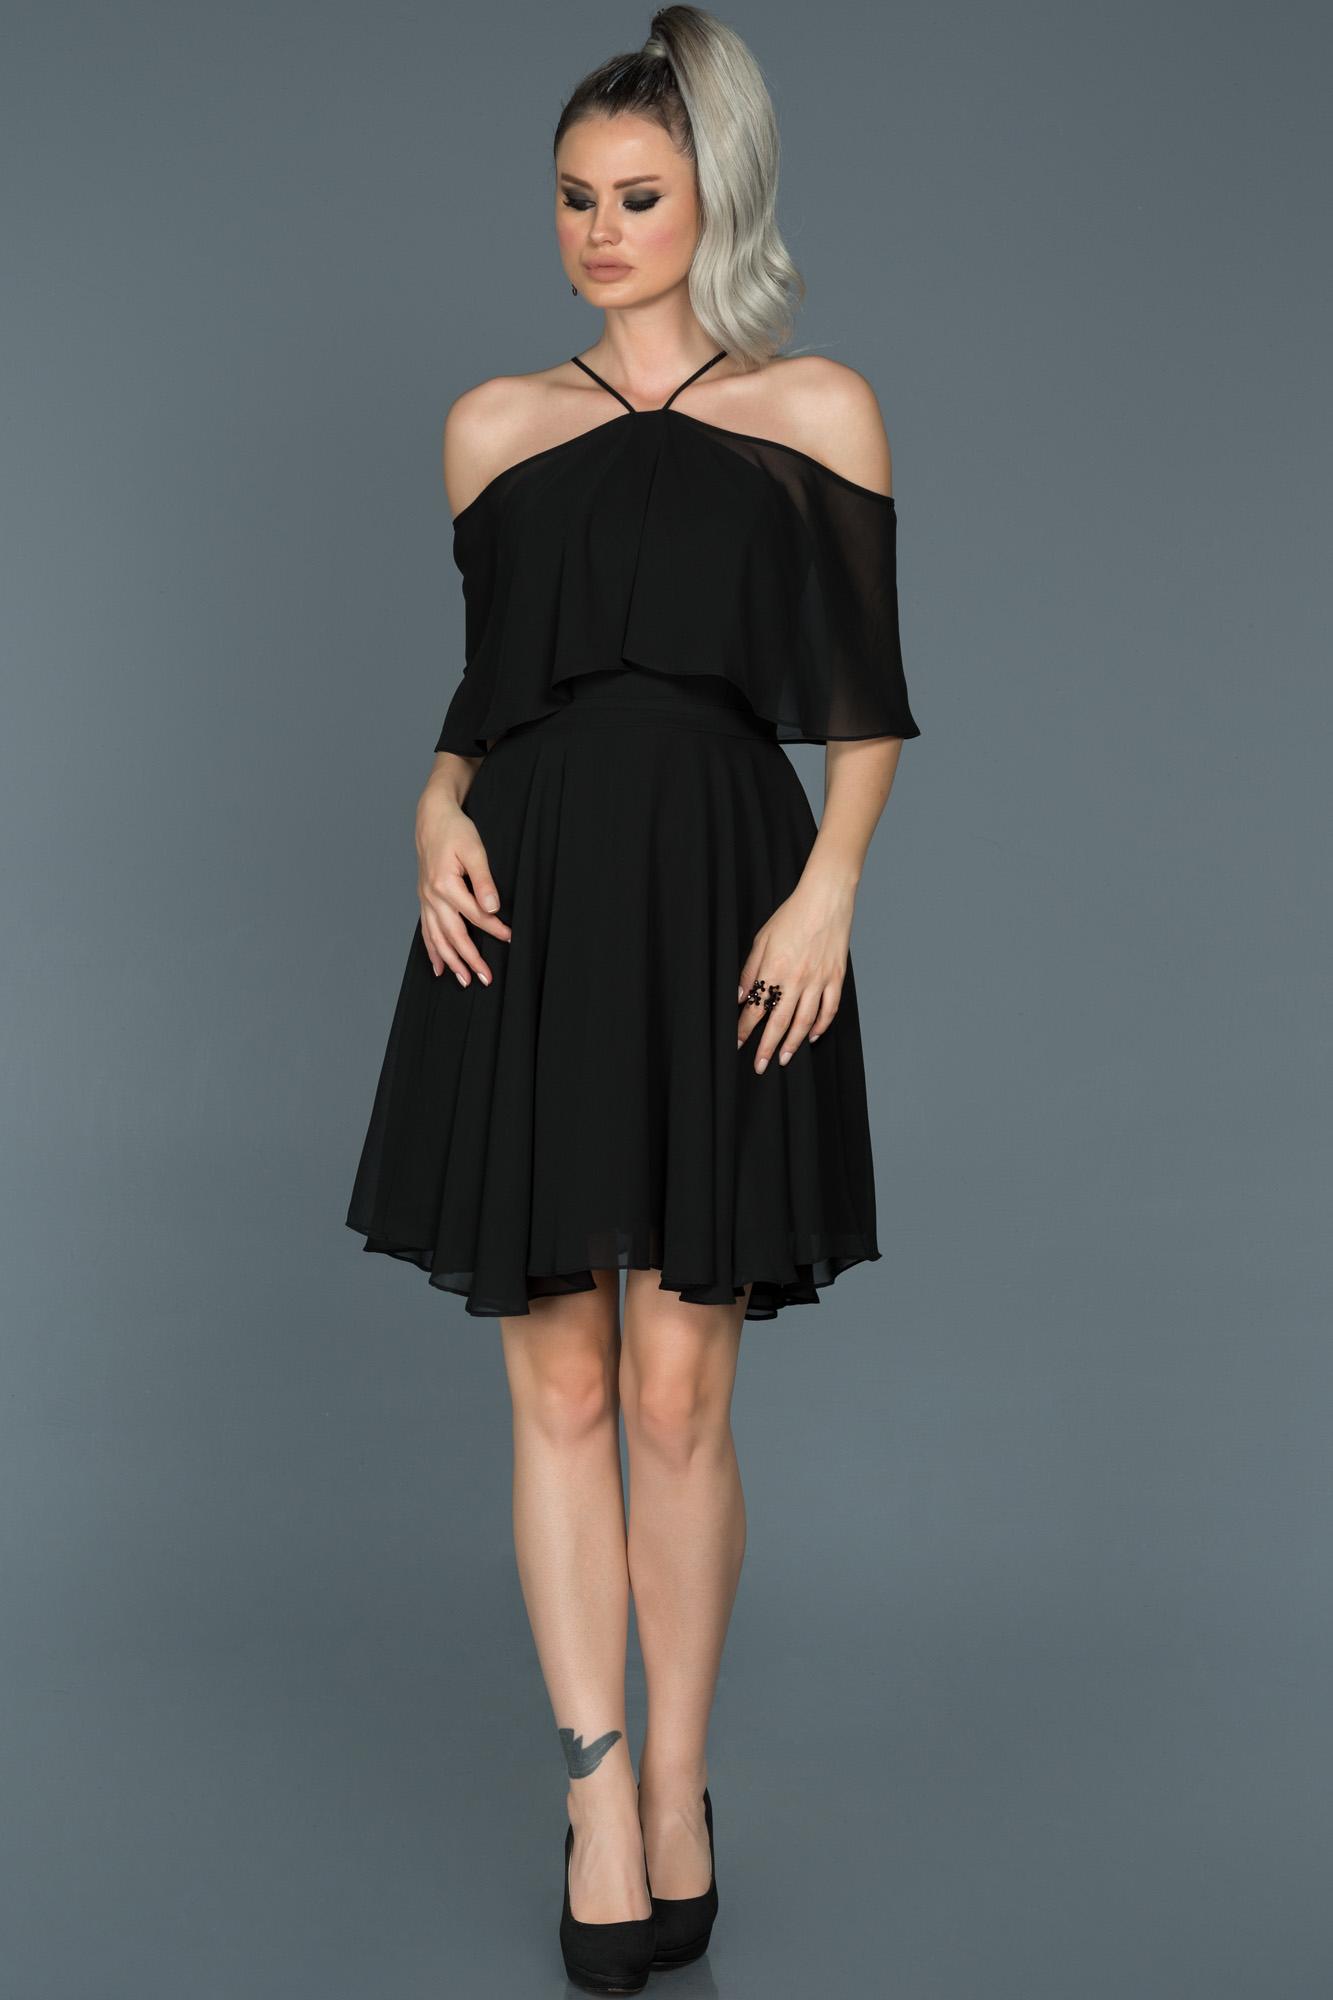 Siyah Kısa Şifon Davet Elbisesi